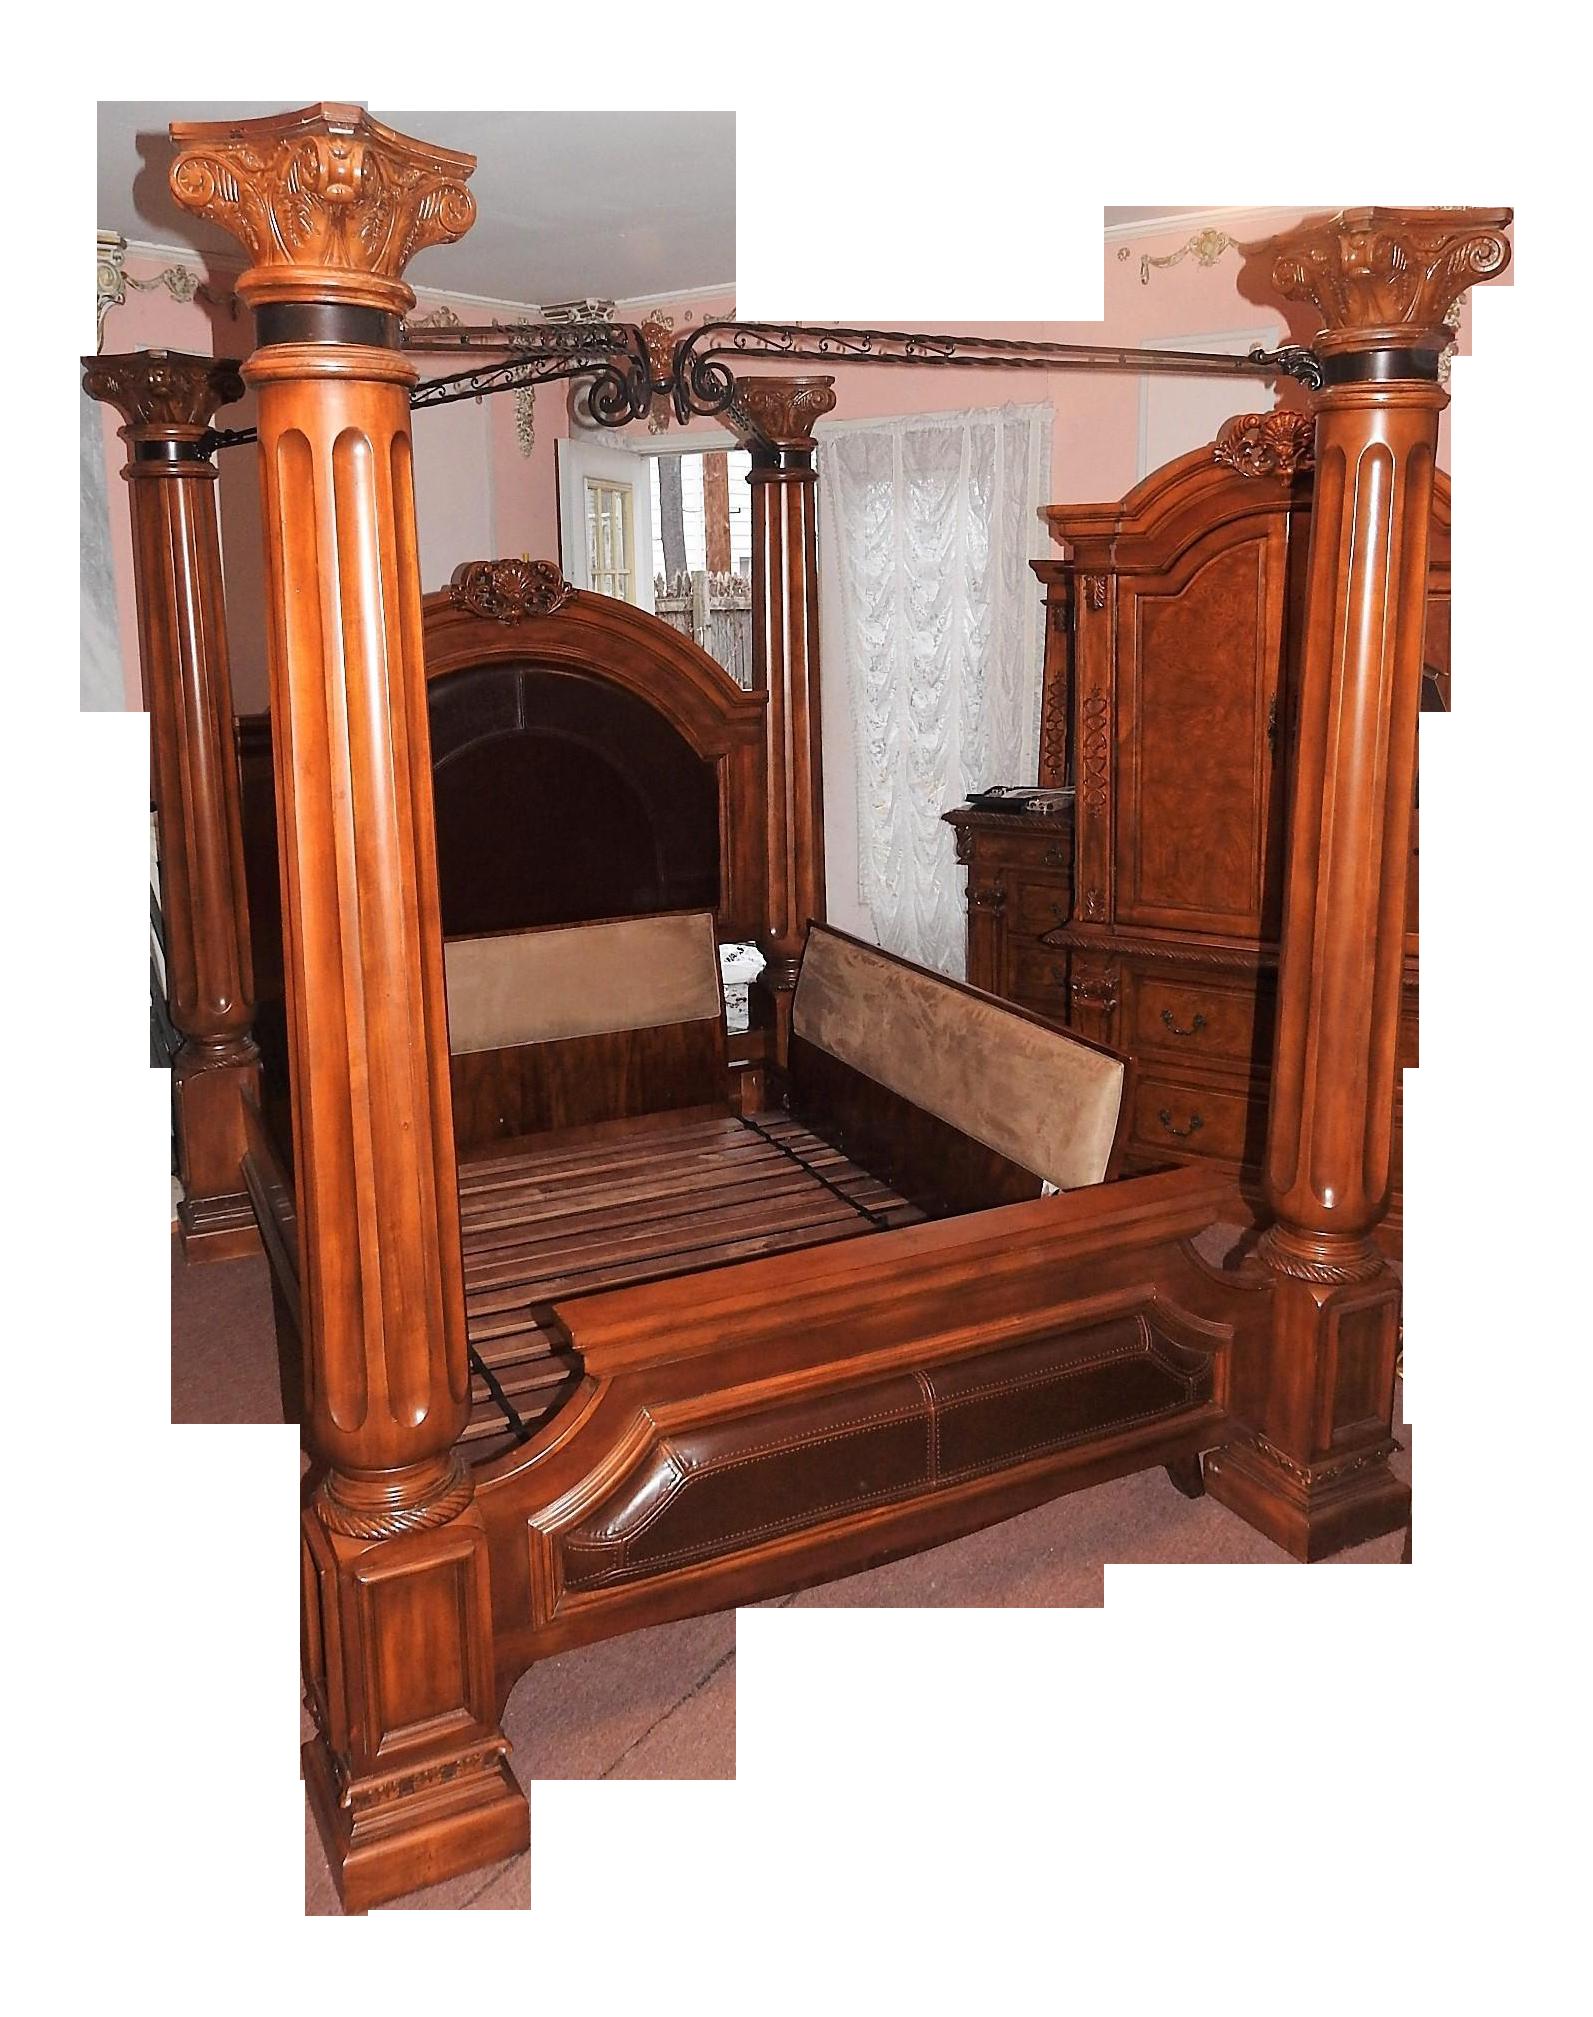 Luxury 4Pillar Cherry Master Bedframe Bed frame